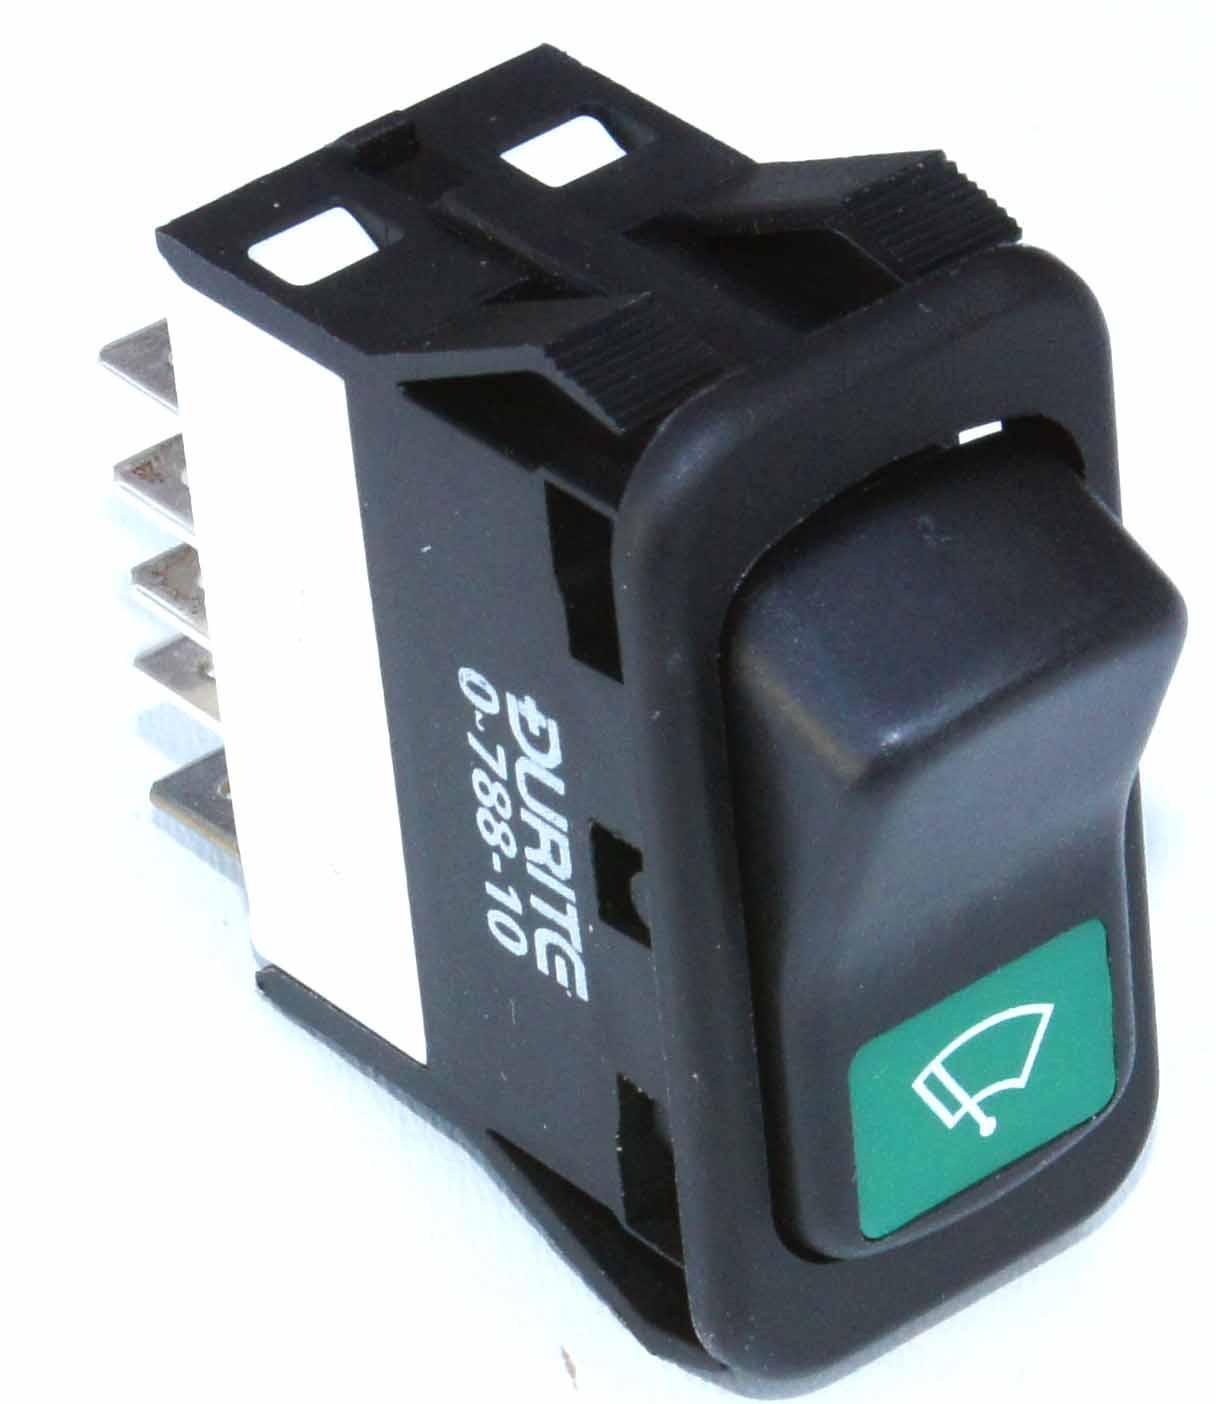 2 Speed Wiper Rocker Switch Black Car Builder Solutions